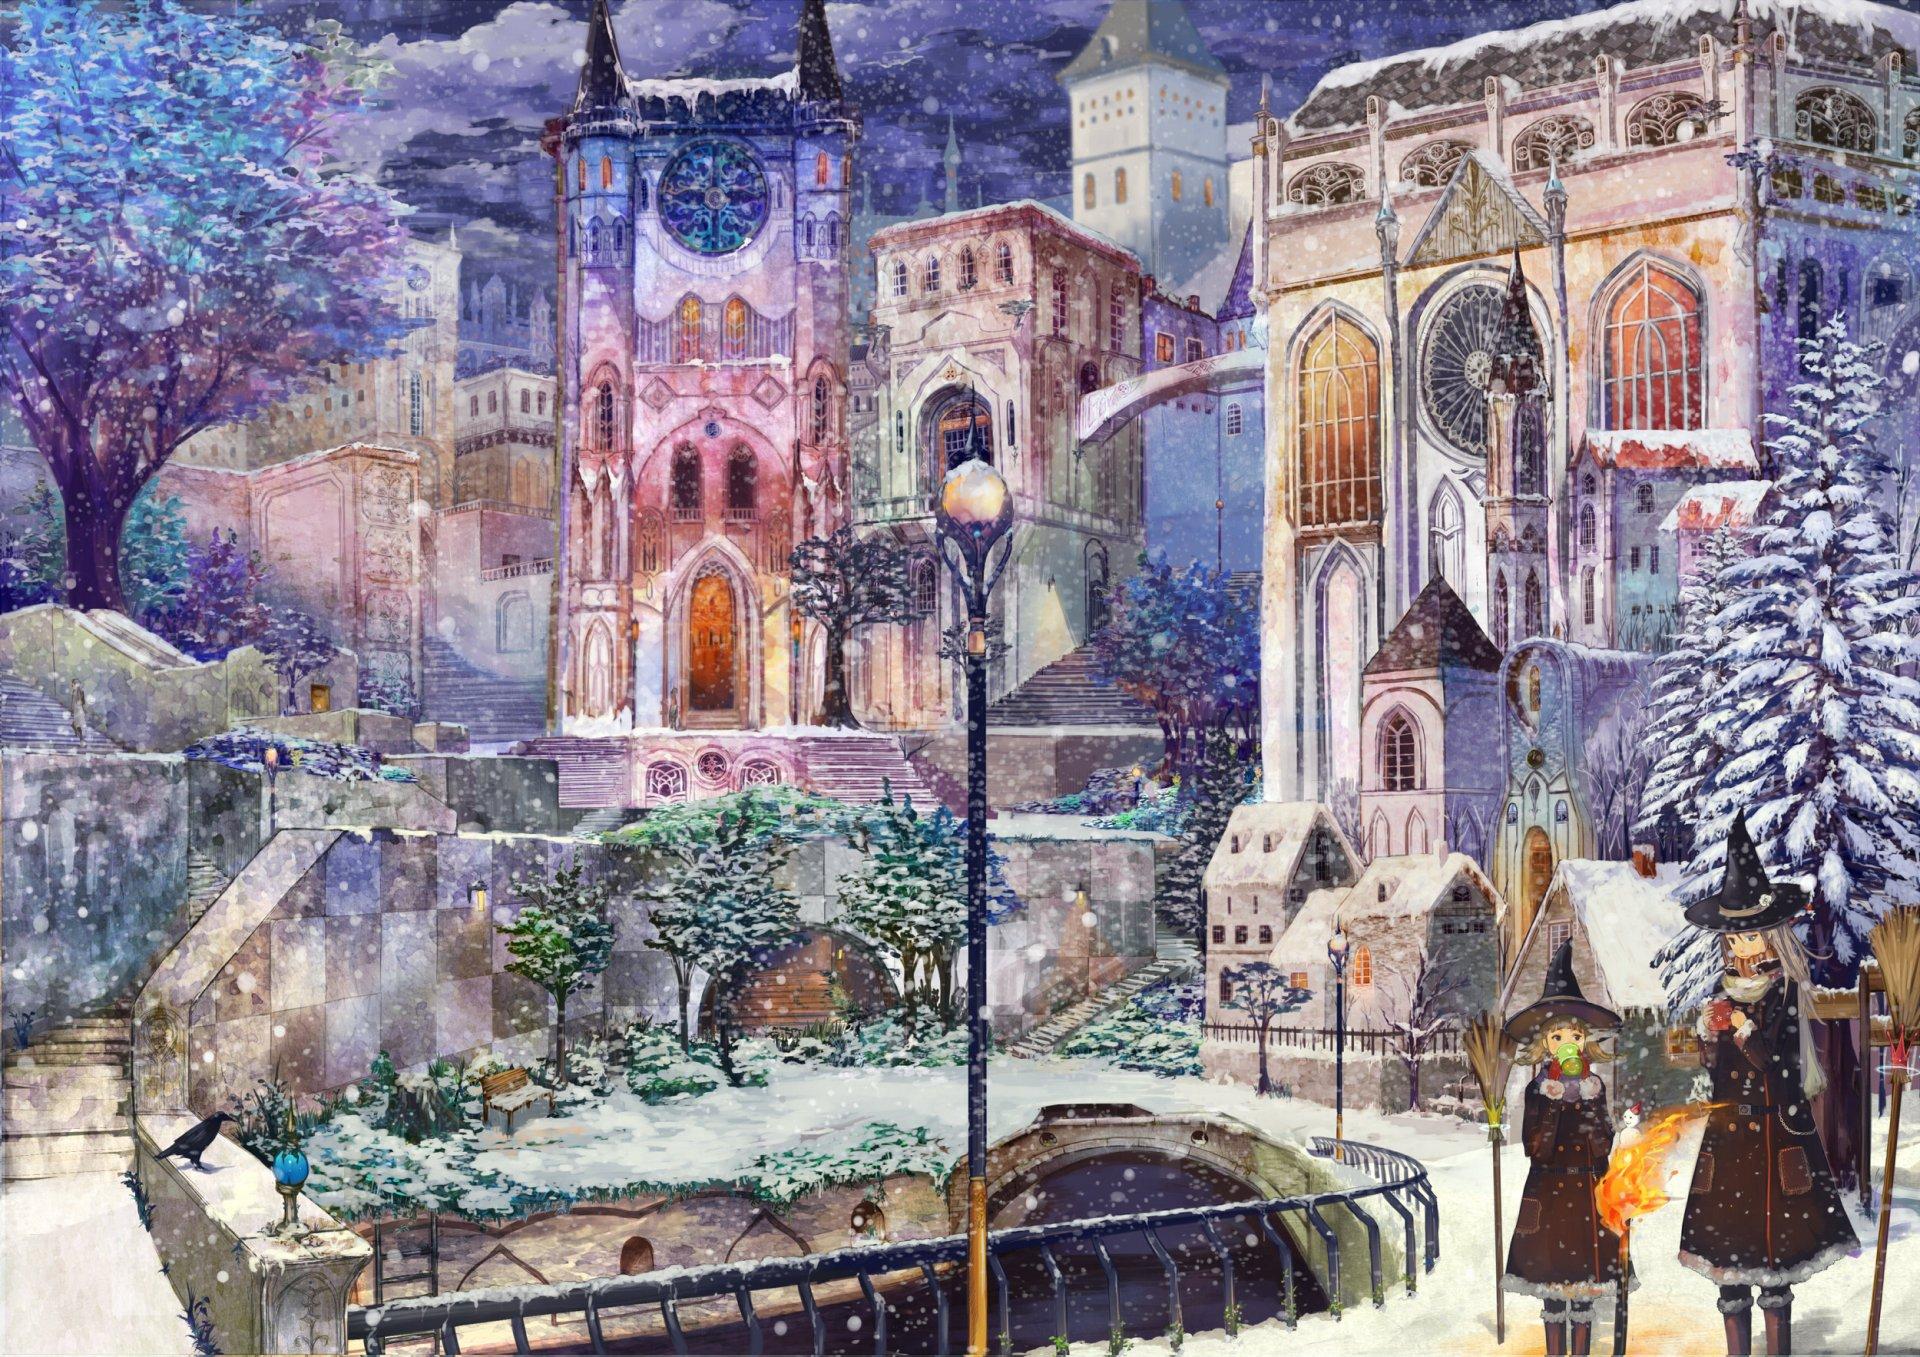 City HD Wallpaper | Background Image | 2500x1767 ...